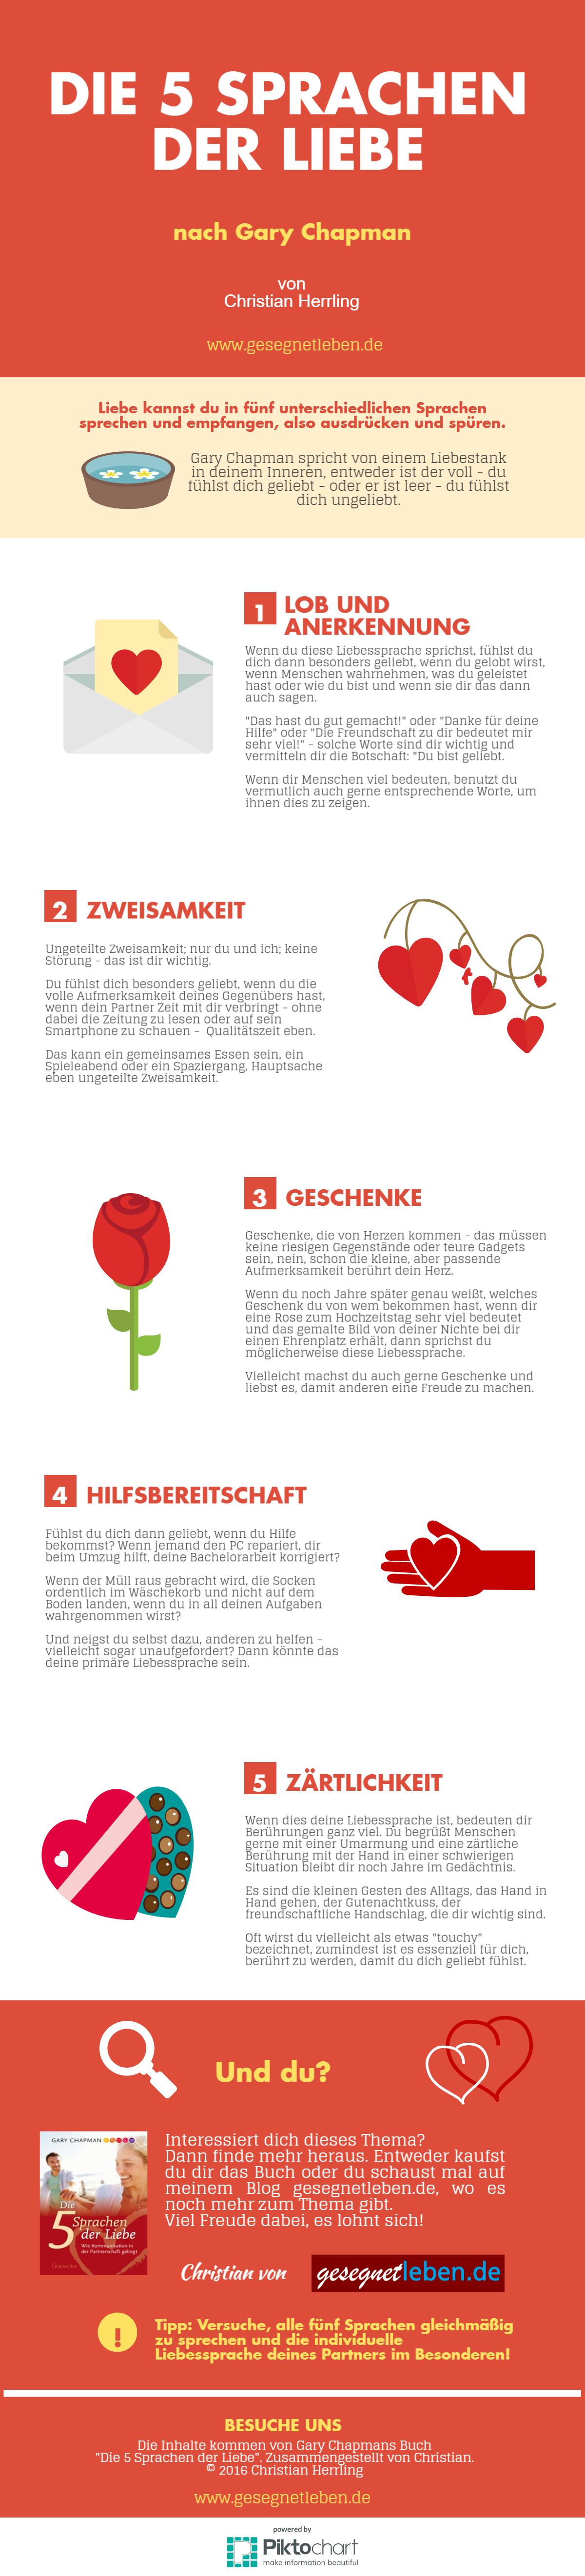 Infografik 5 Sprachen der Liebe © 2016 Christian Herrling gesegnetleben.de